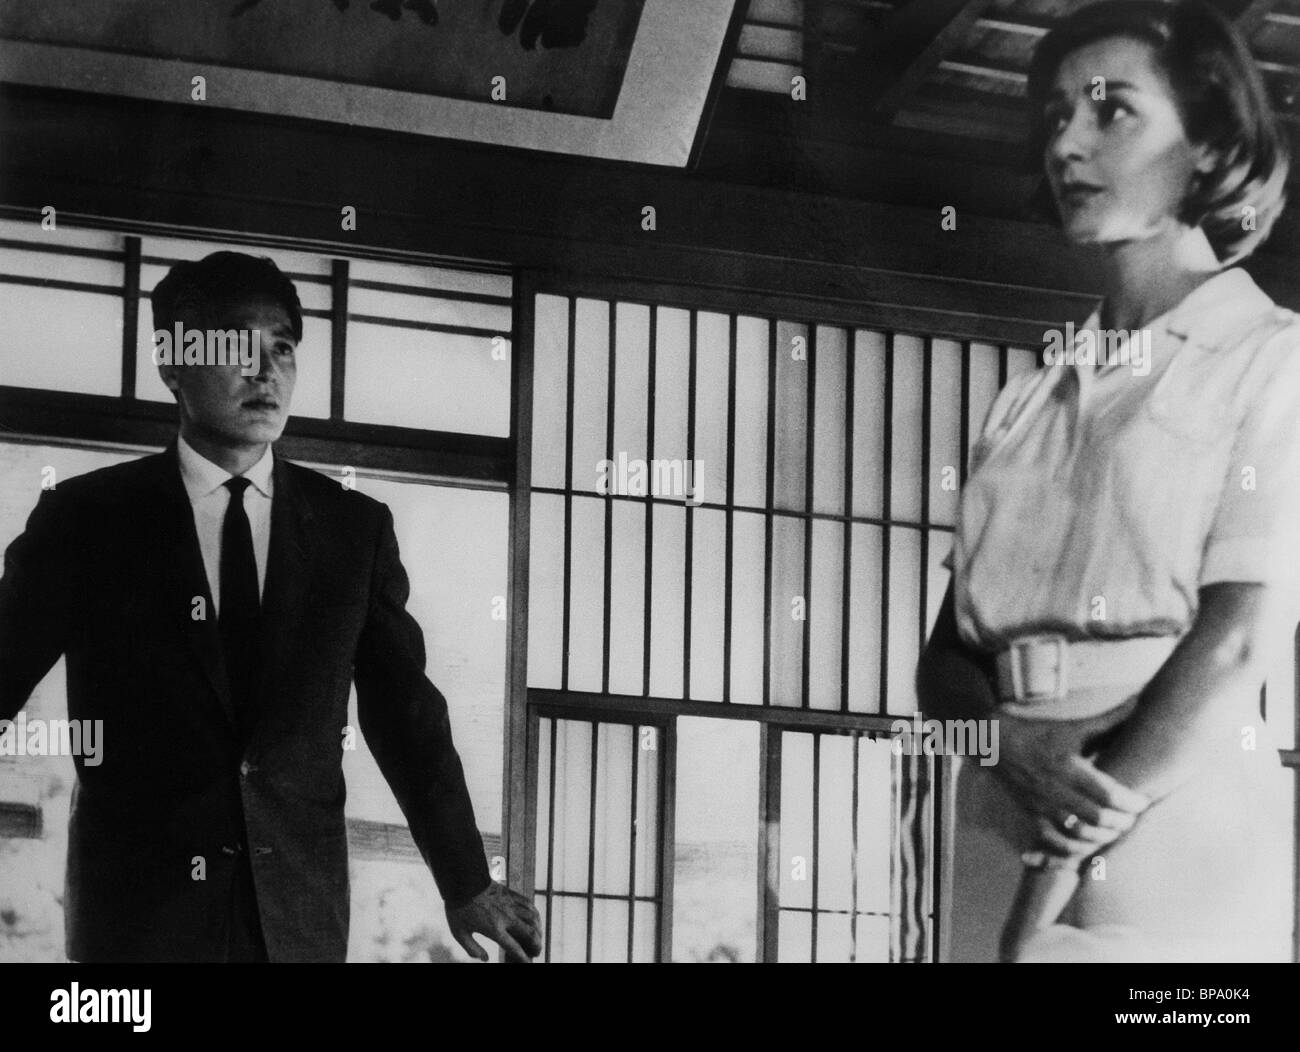 EIJI OKADA, EMMANUELLE RIVA, HIROSHIMA MON AMOUR, 1959 - Stock Image